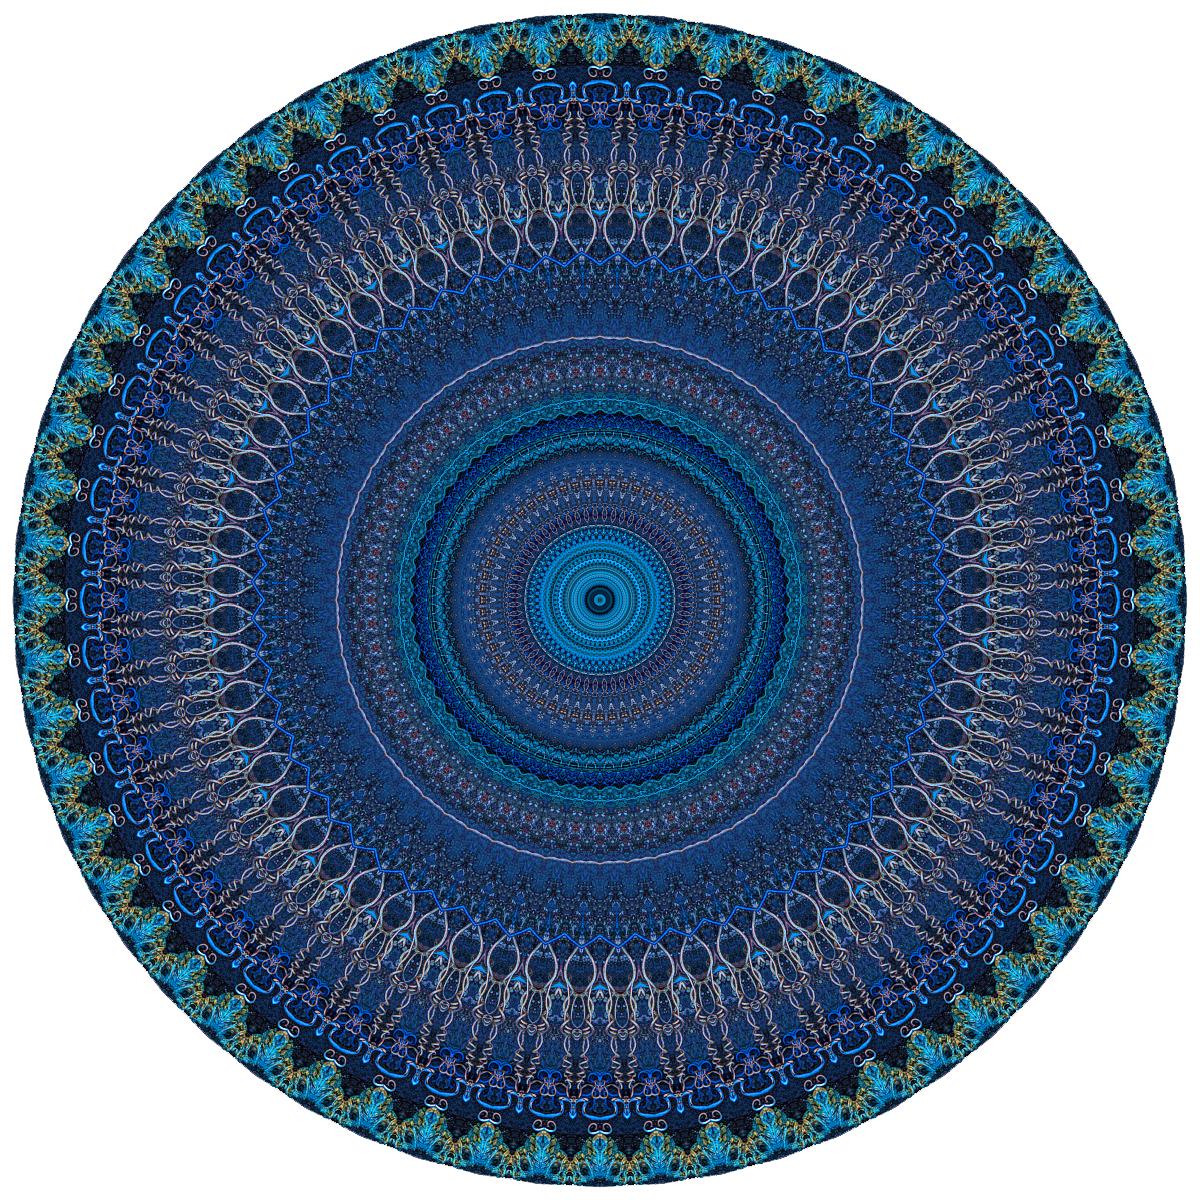 Knysna Blue Unity - Stephen Calhoun